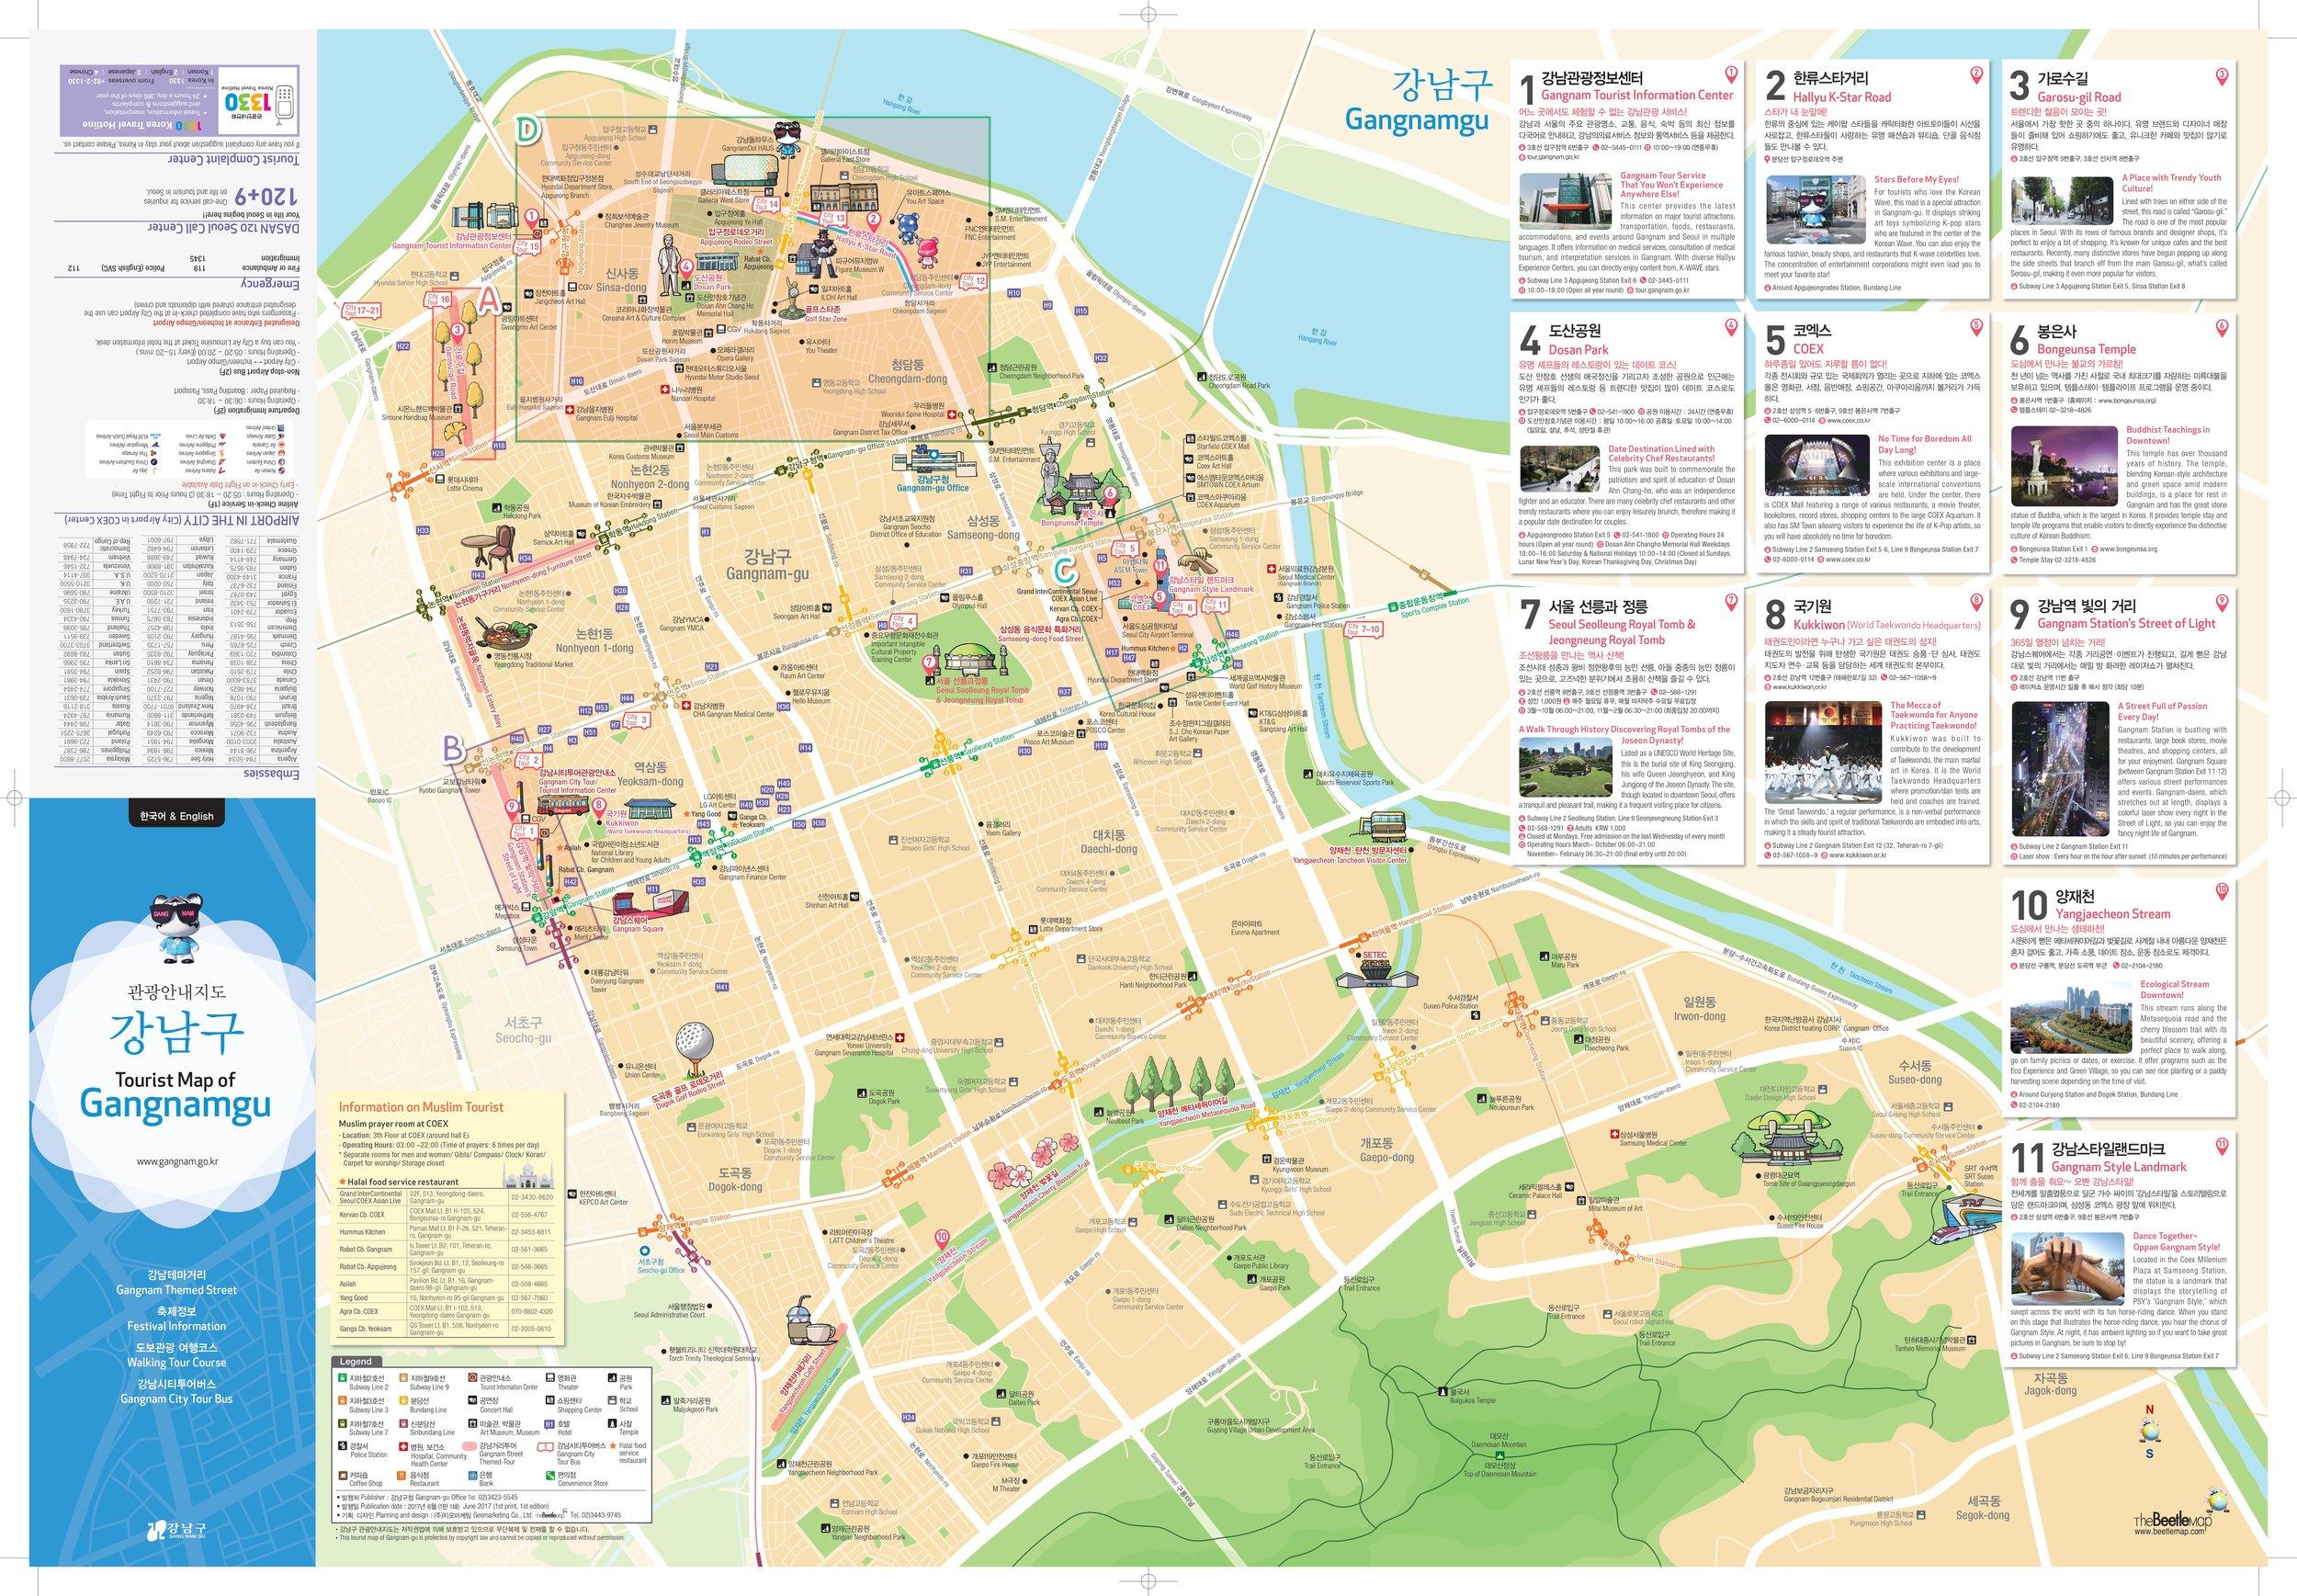 Tourist Map of Gangnam